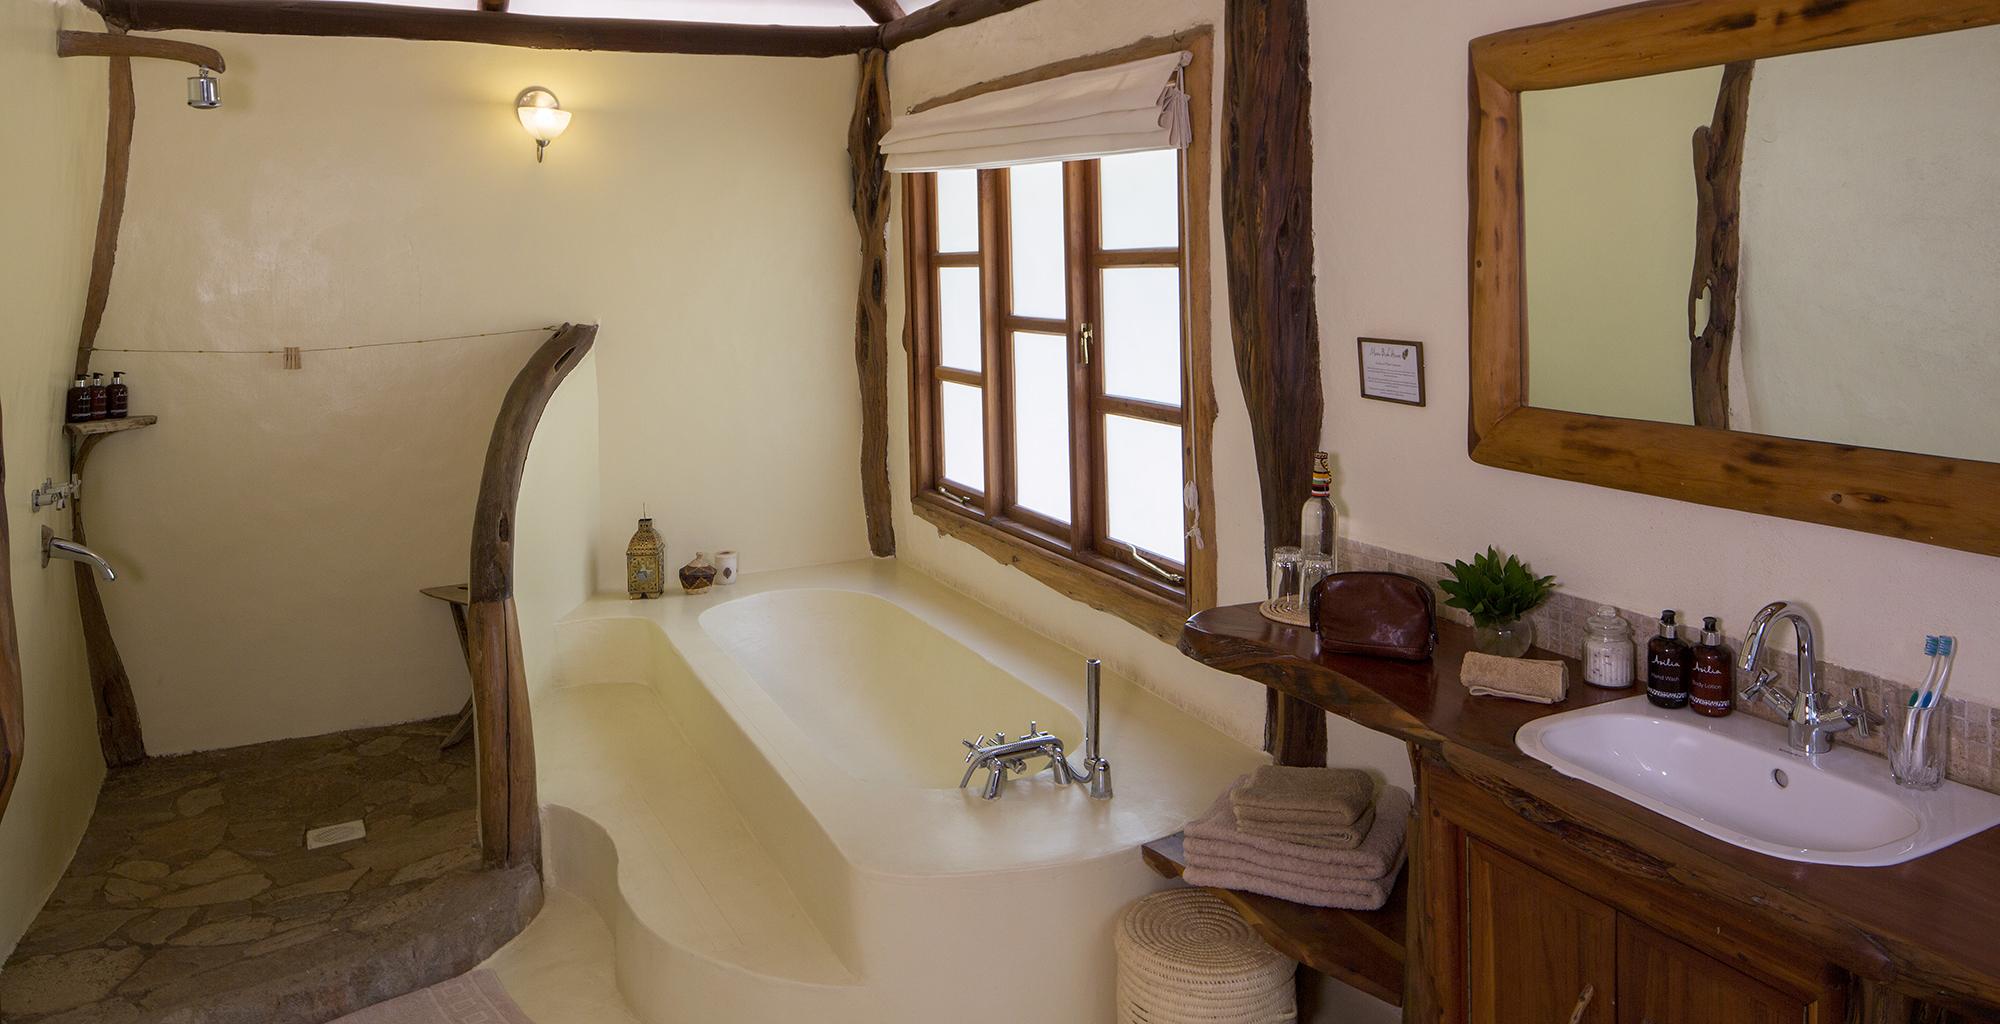 Kenya-Mara-House-Bathroom